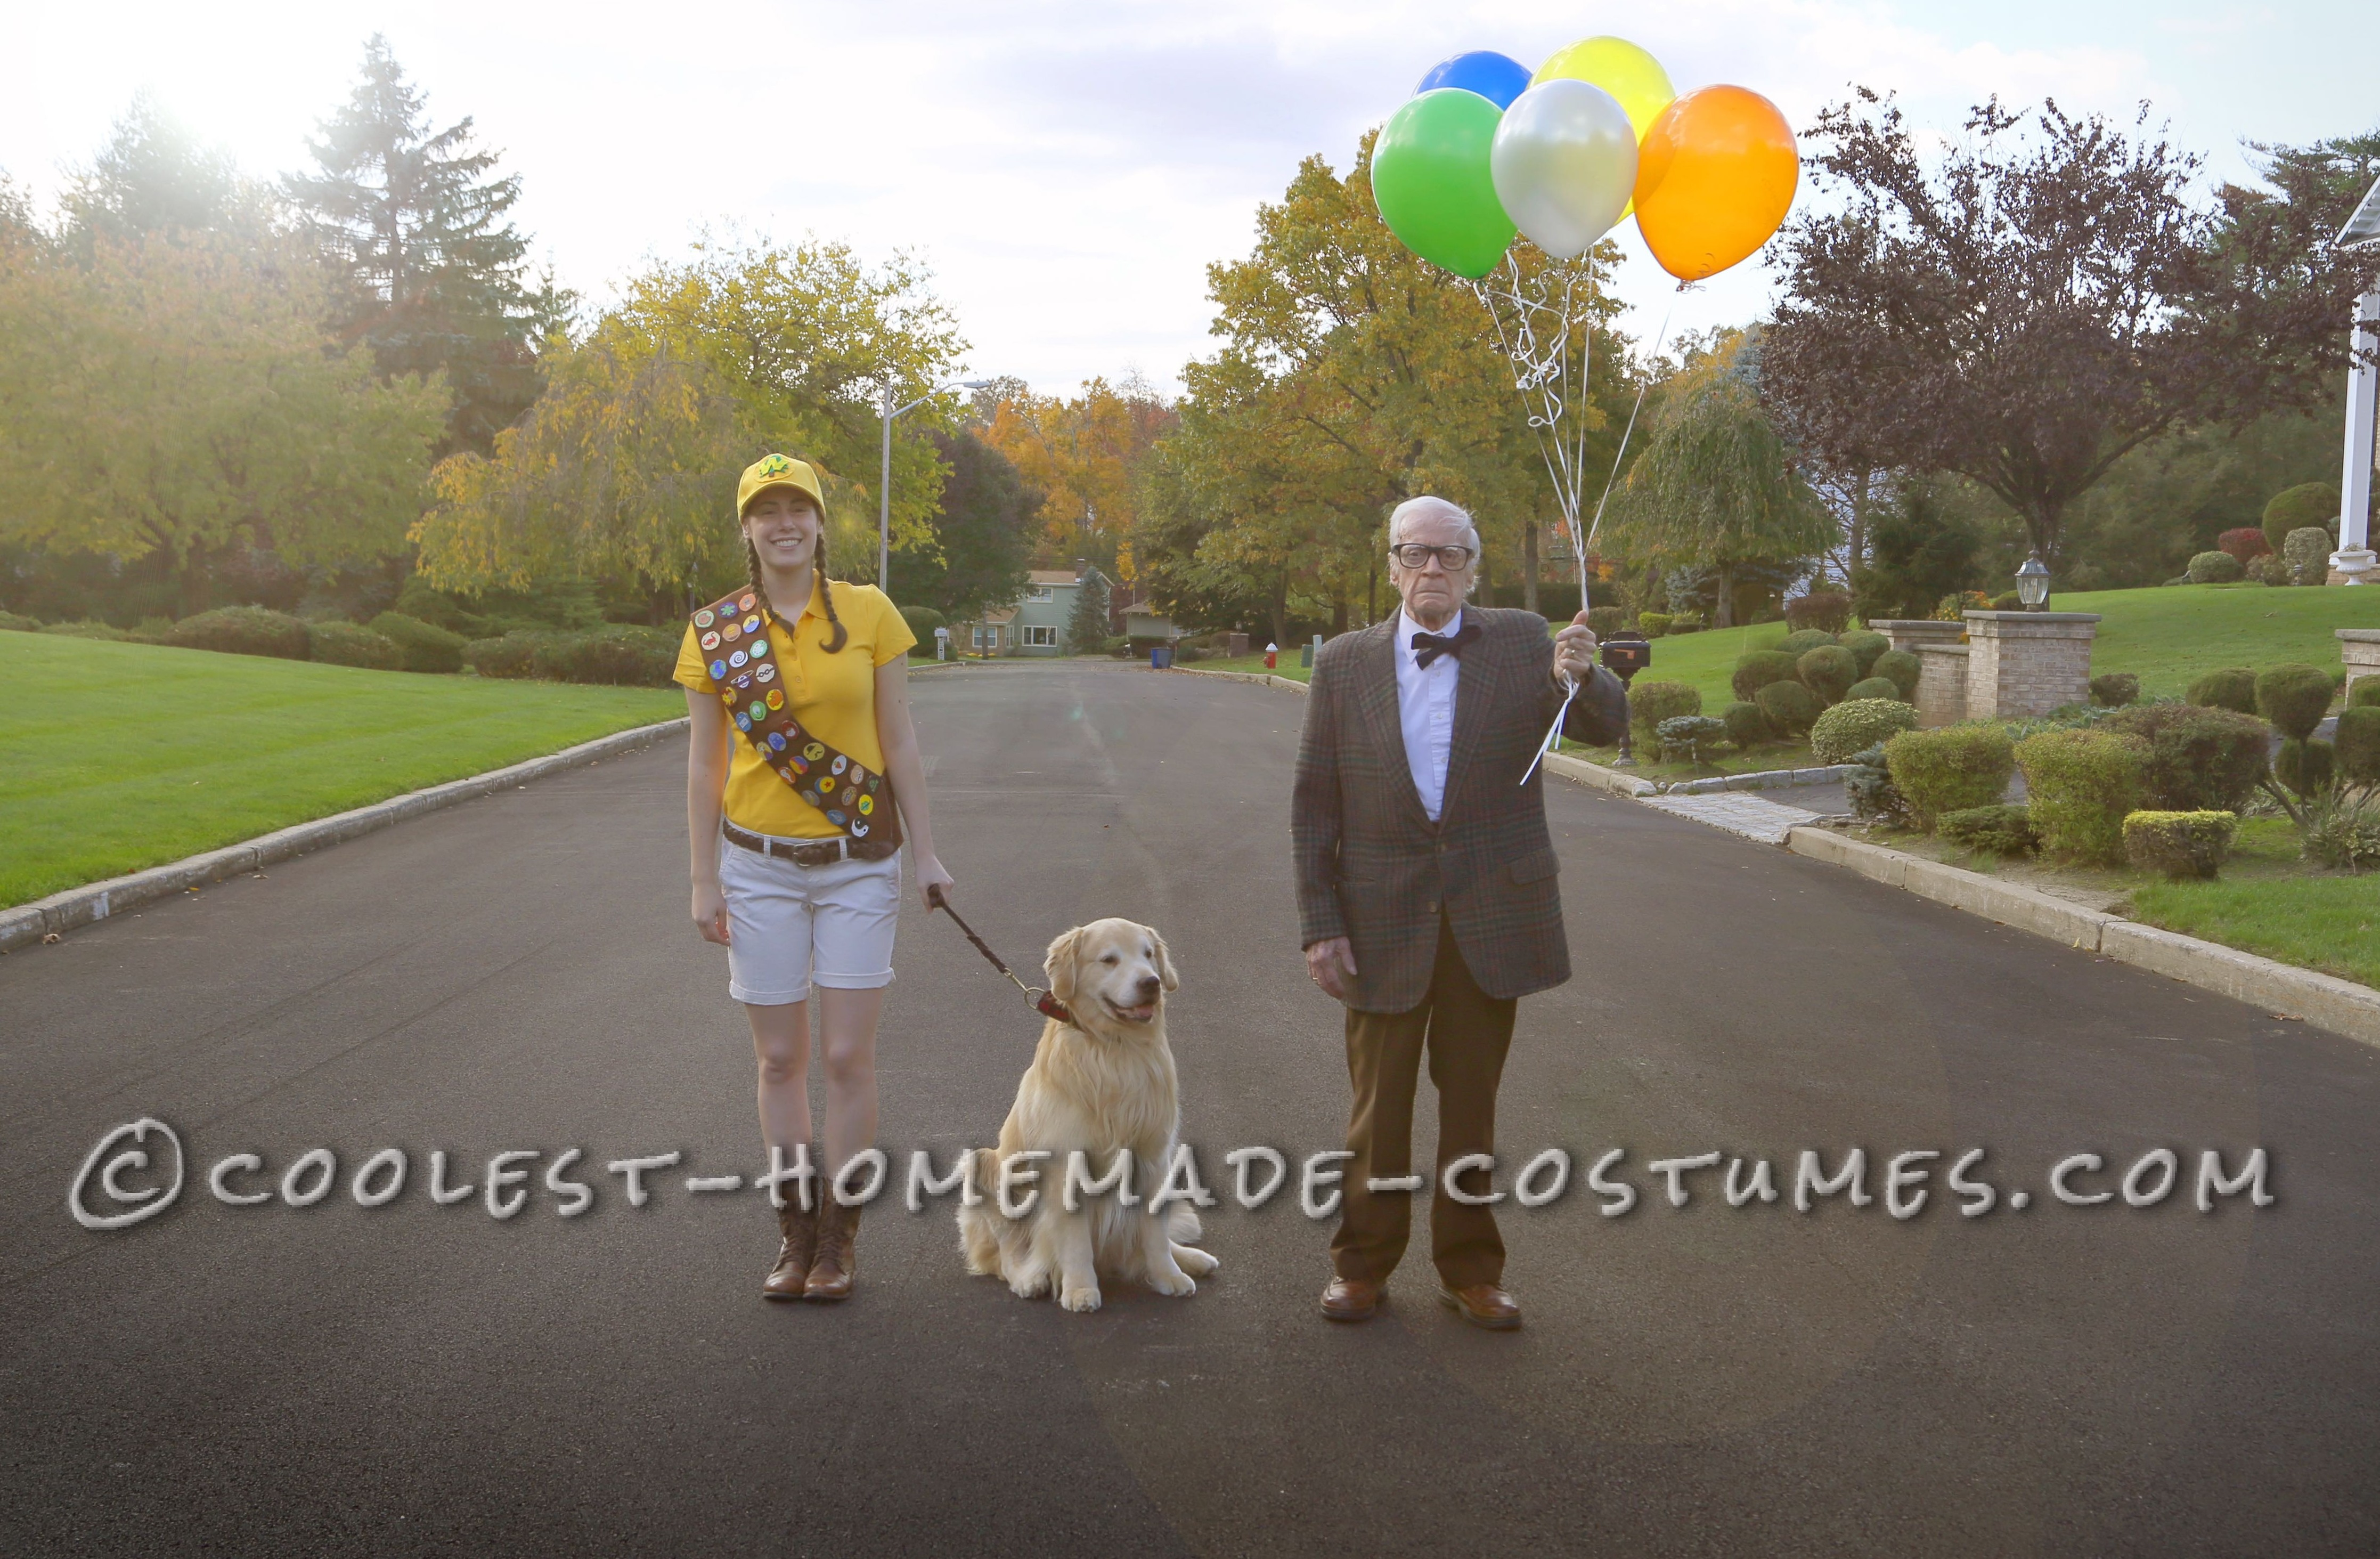 Bonding with Grandpa: Homemade Up Couple Costume